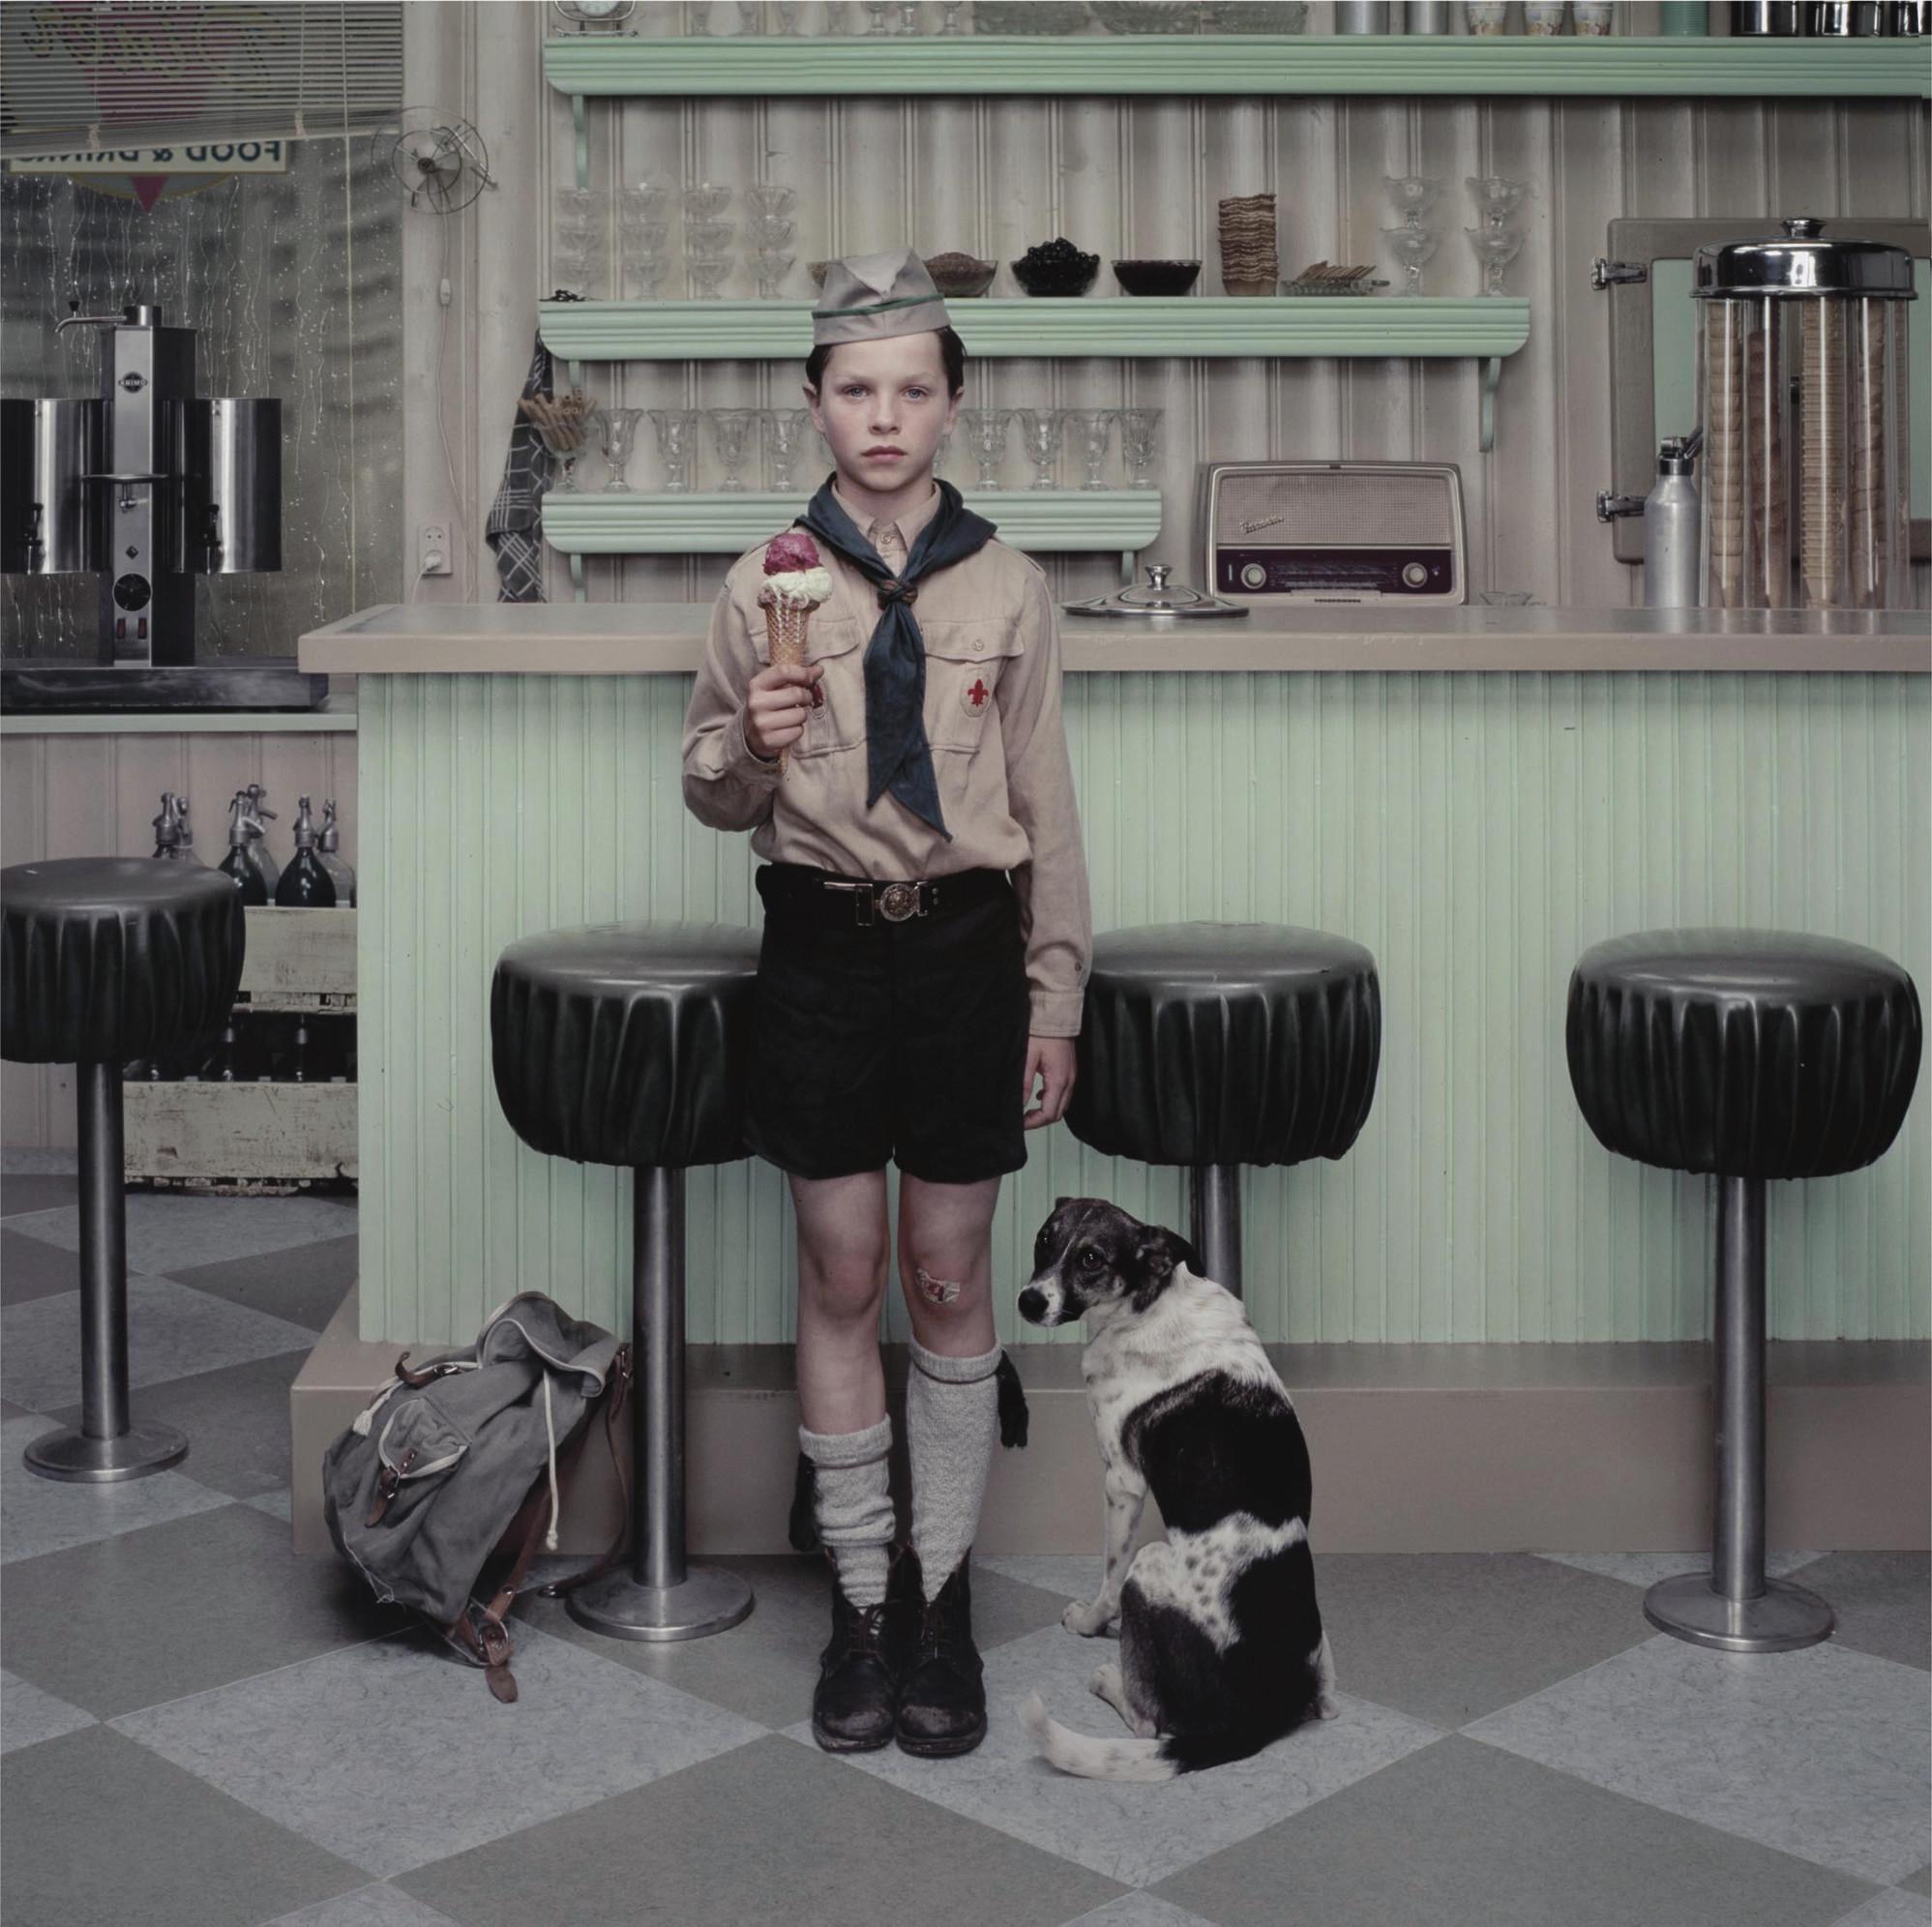 The Ice Cream Parlour from 'Rain', 2004